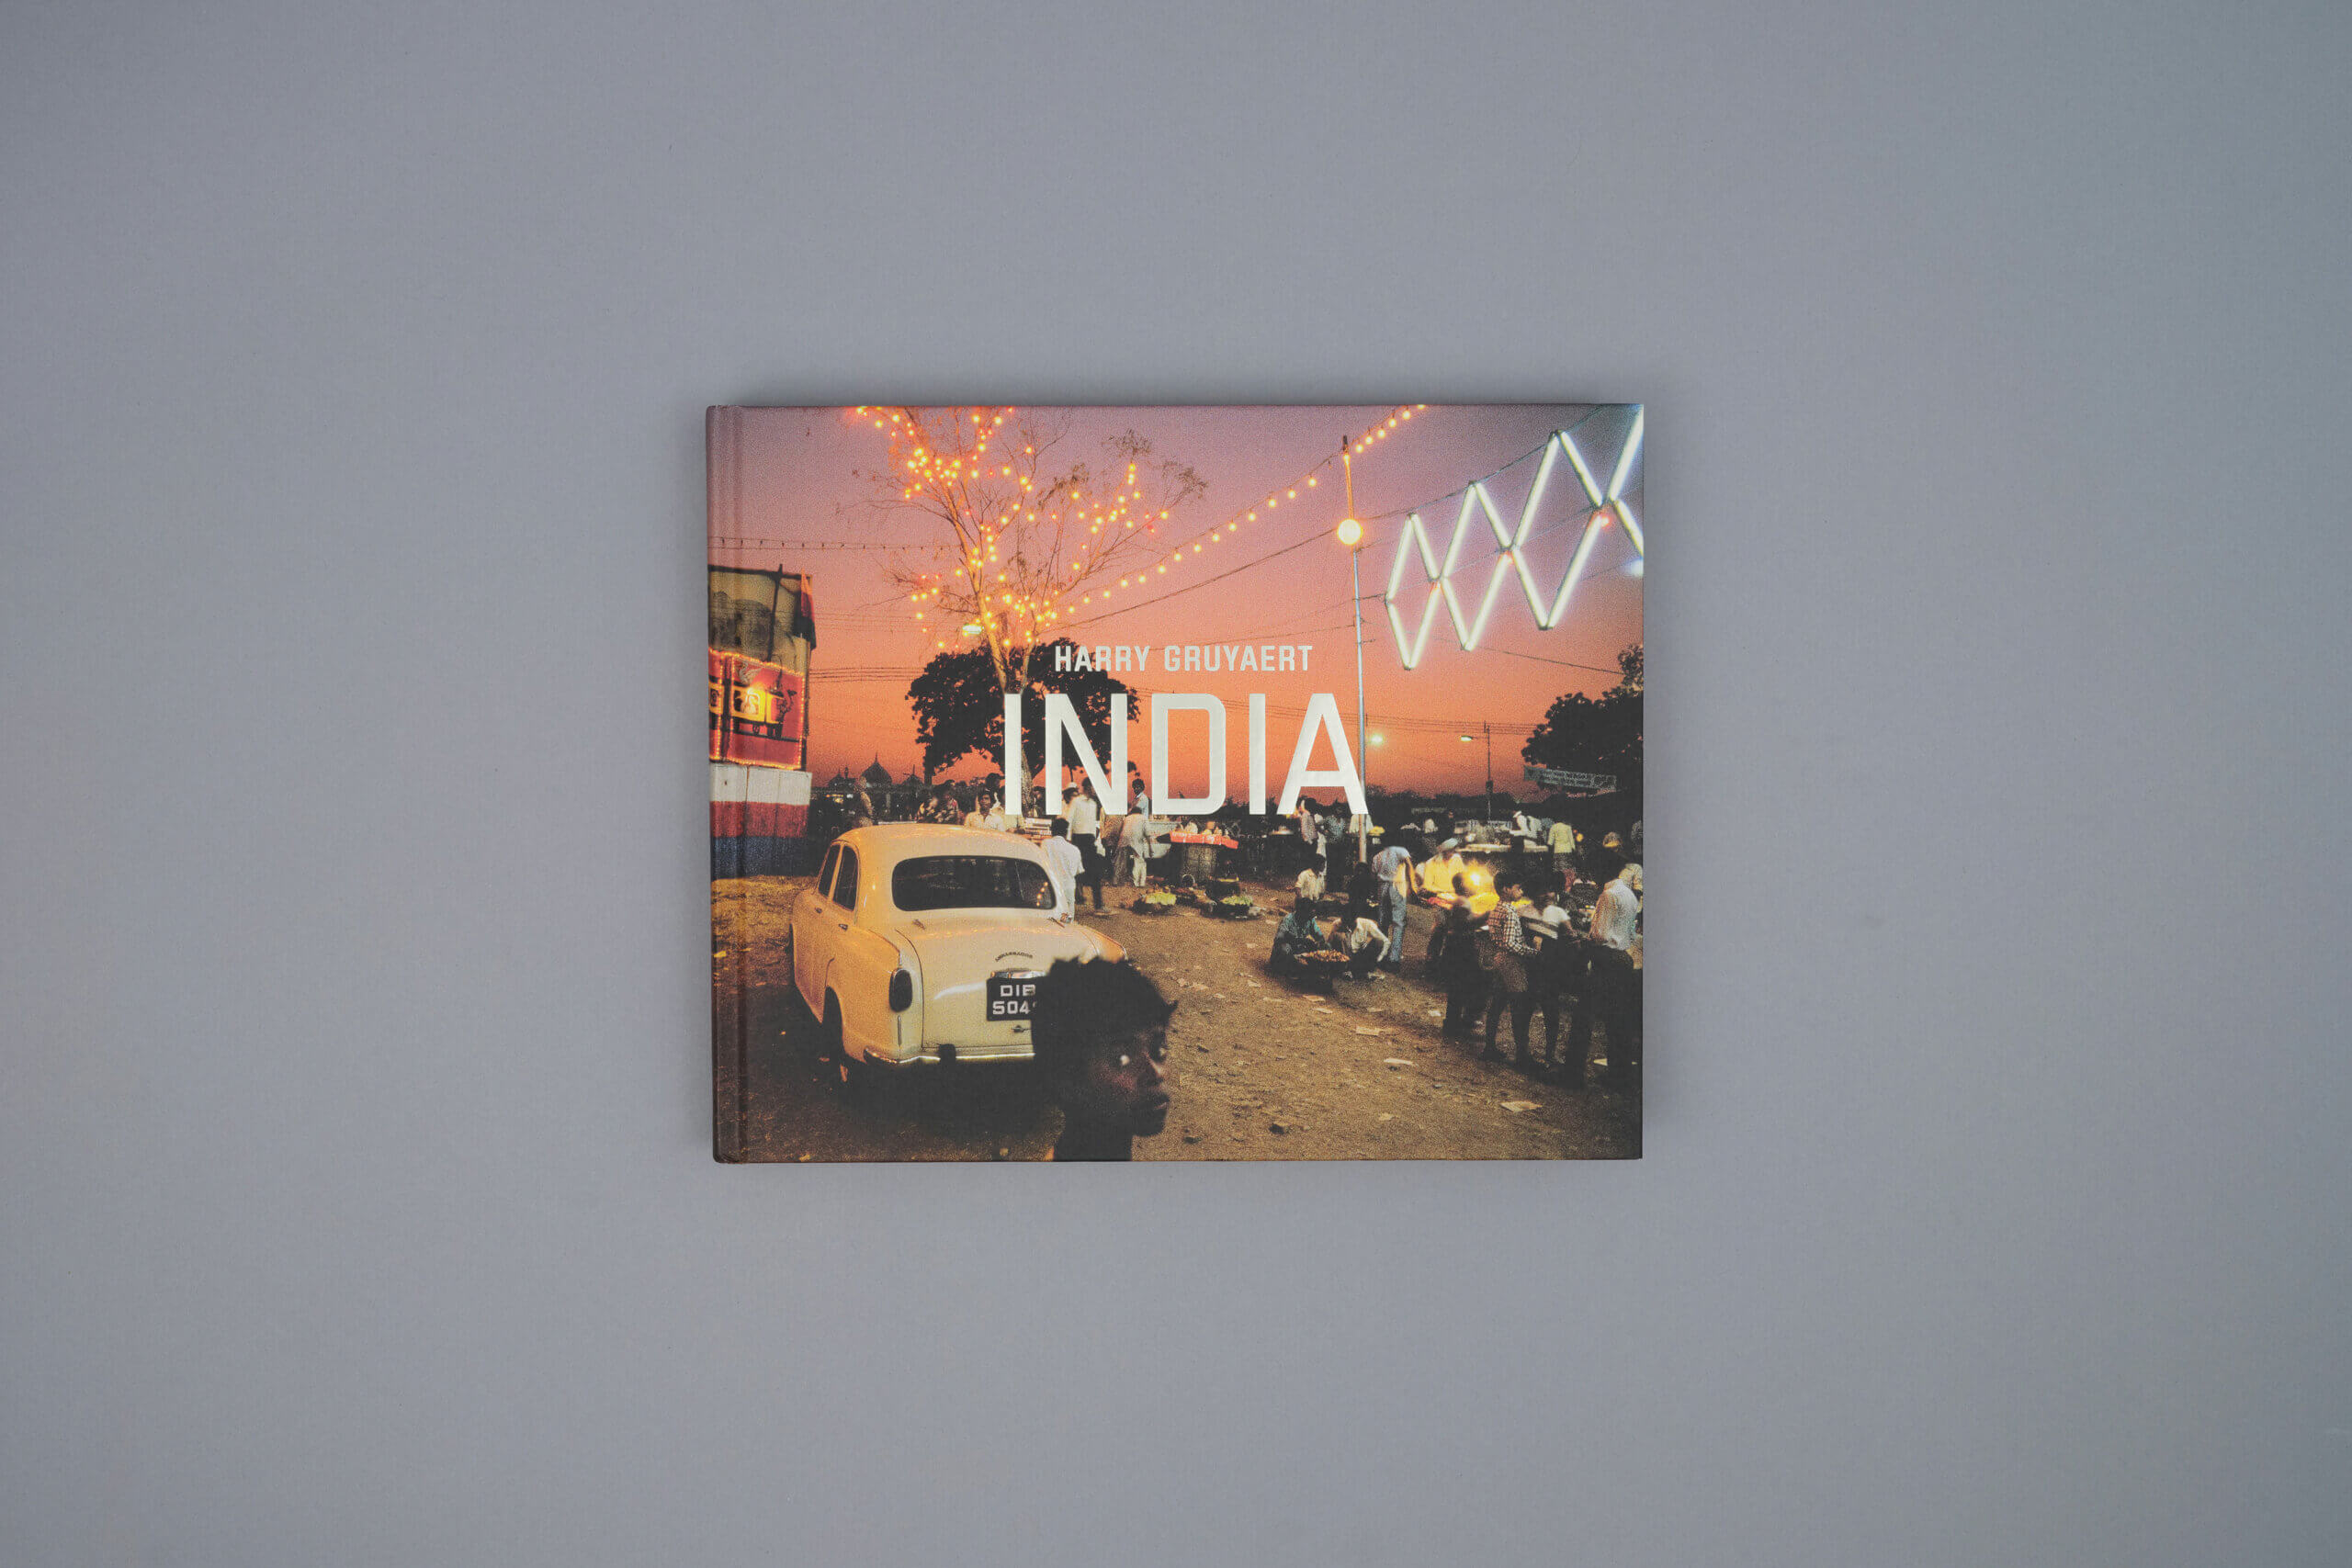 India-gruyaert-barral-couve